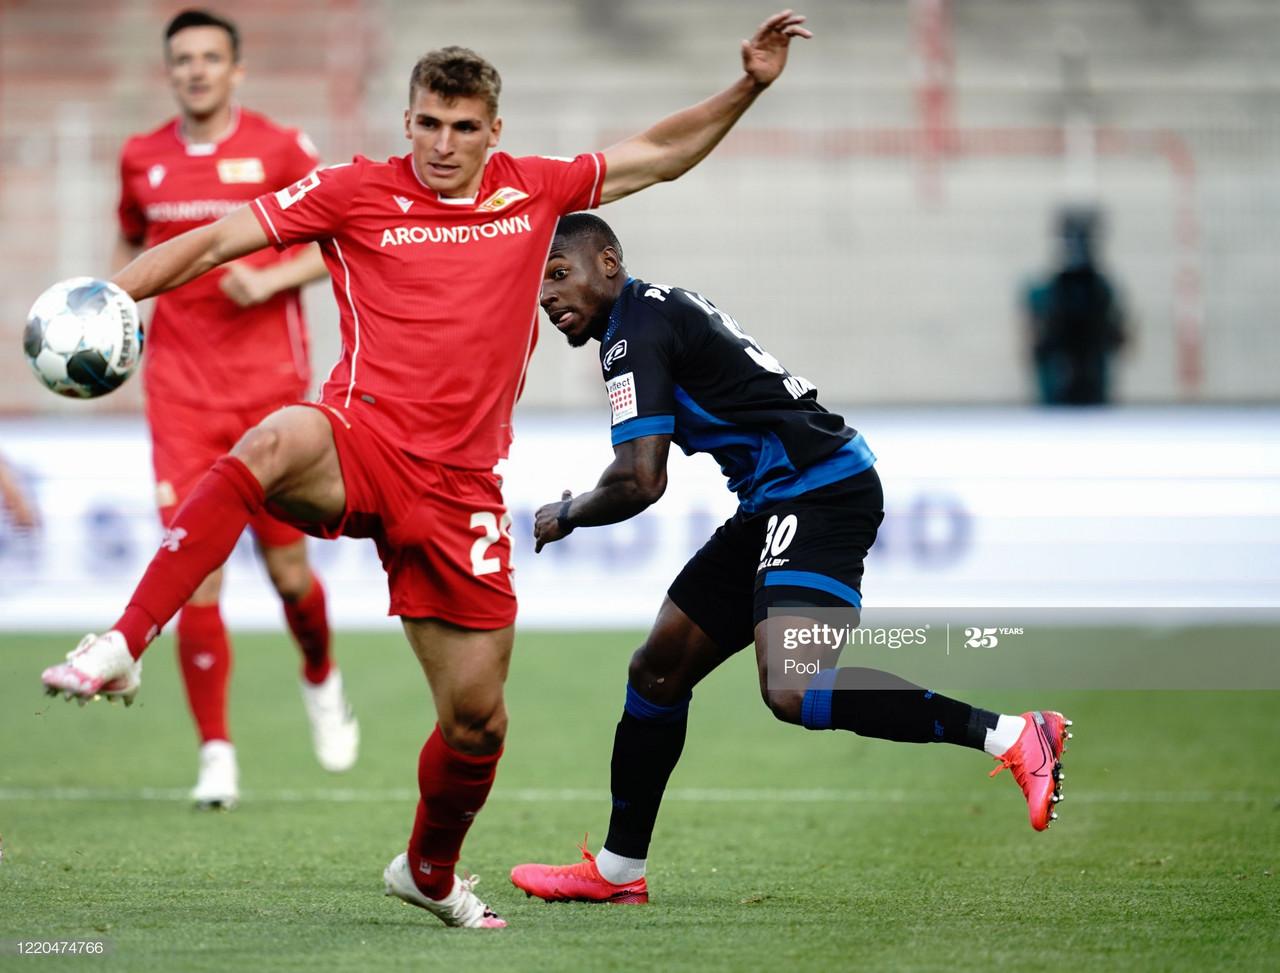 Union Berlin 1-0 Paderborn: Berlin secure Bundesliga status as Paderborn are relegated